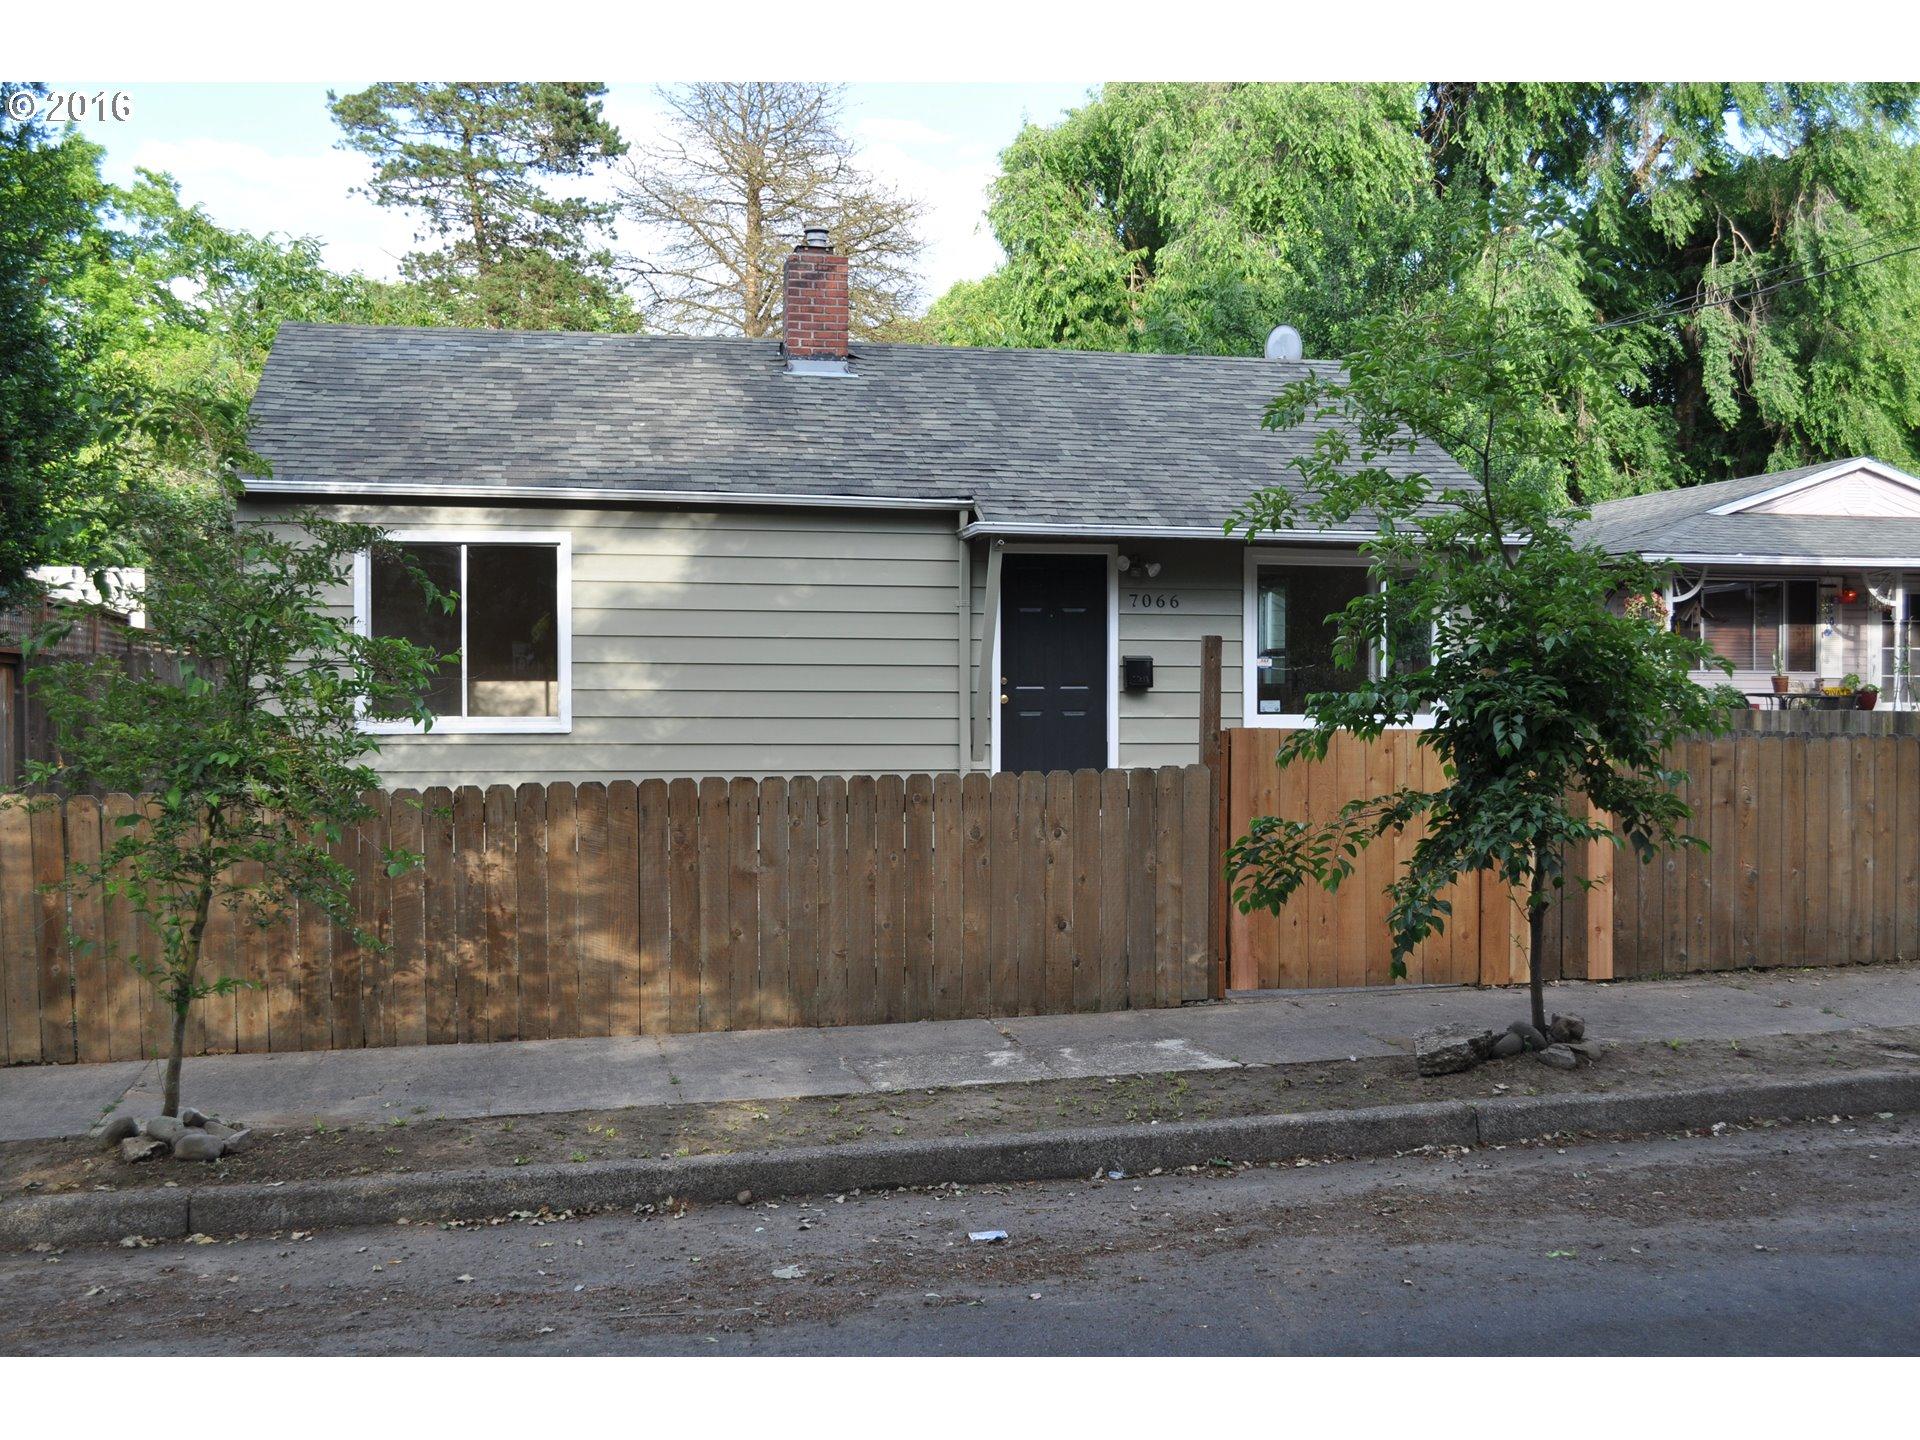 7066 NE 8TH AVE, Portland OR 97211